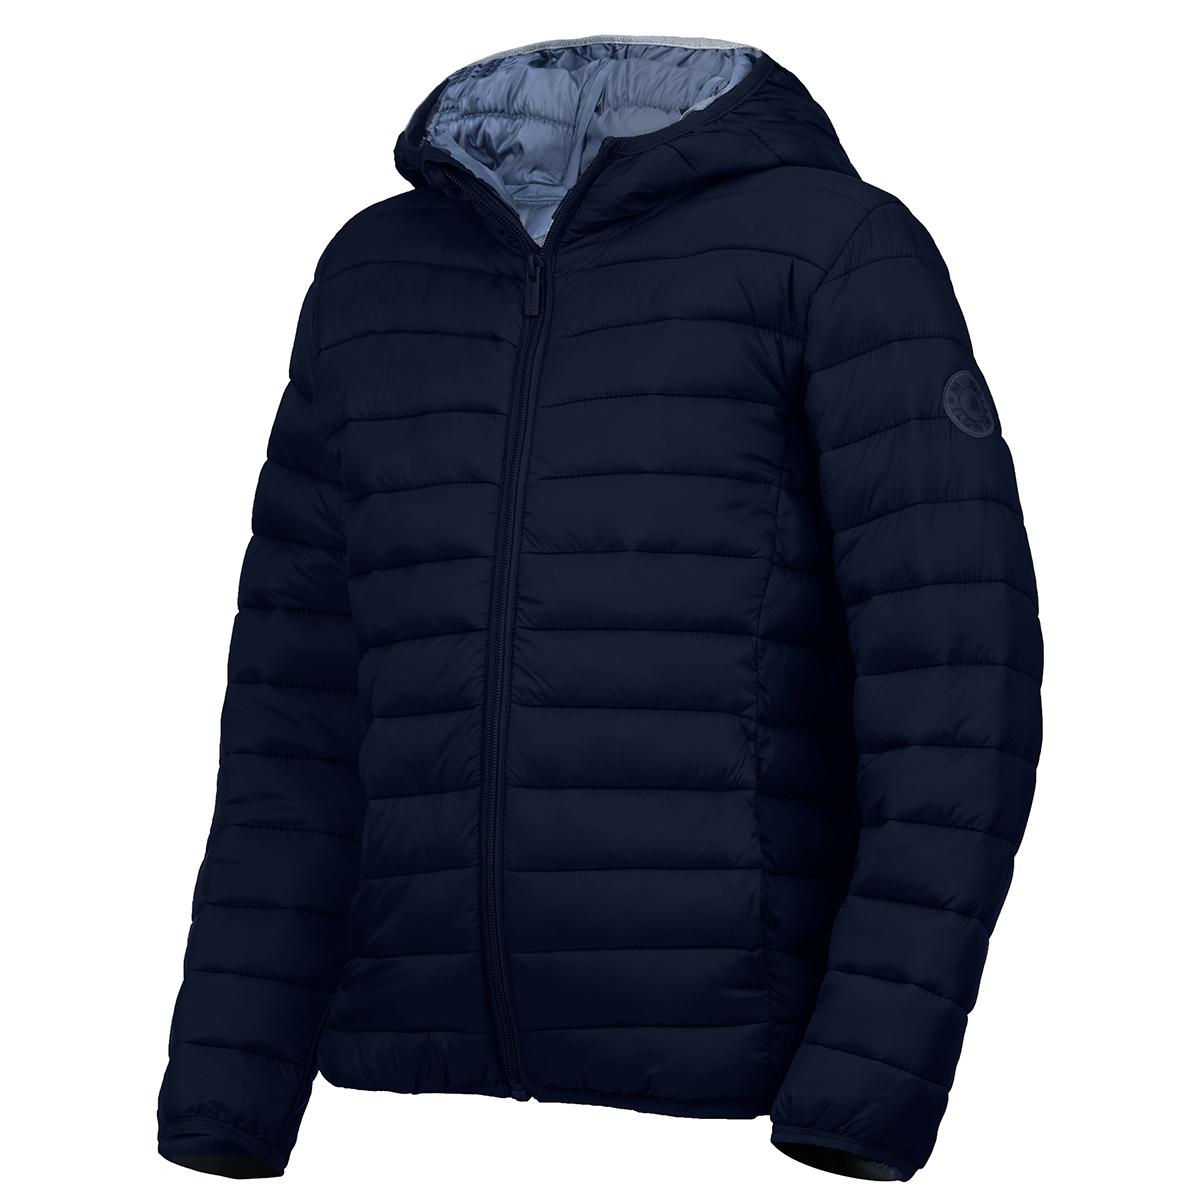 Minoti Little Boys' Basic Puffa Jacket - Blue, 7-8X